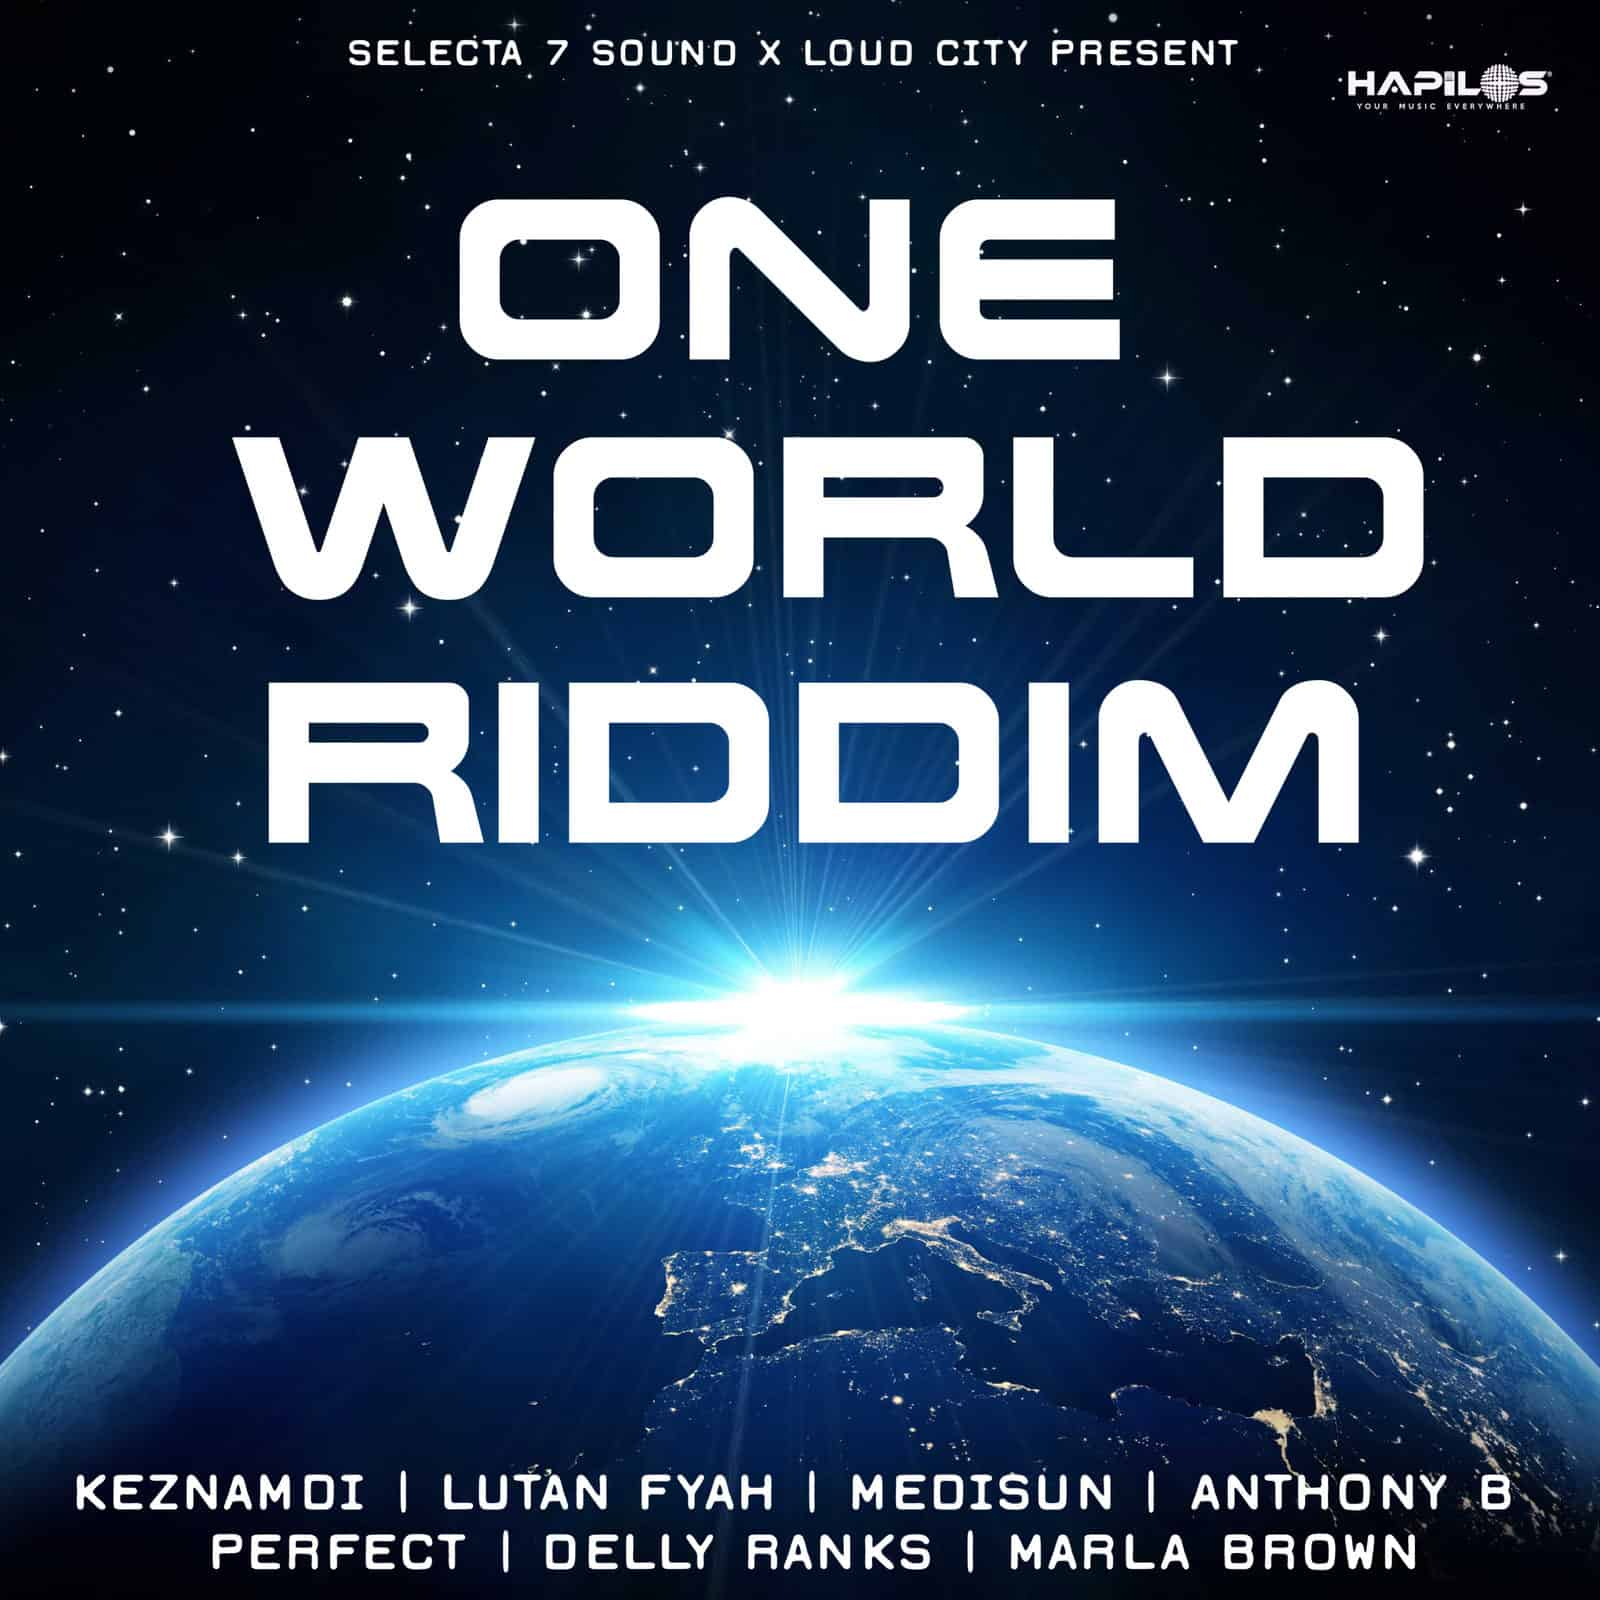 One World Riddim - Various Artists -  Selecta 7 Sound / Loud City